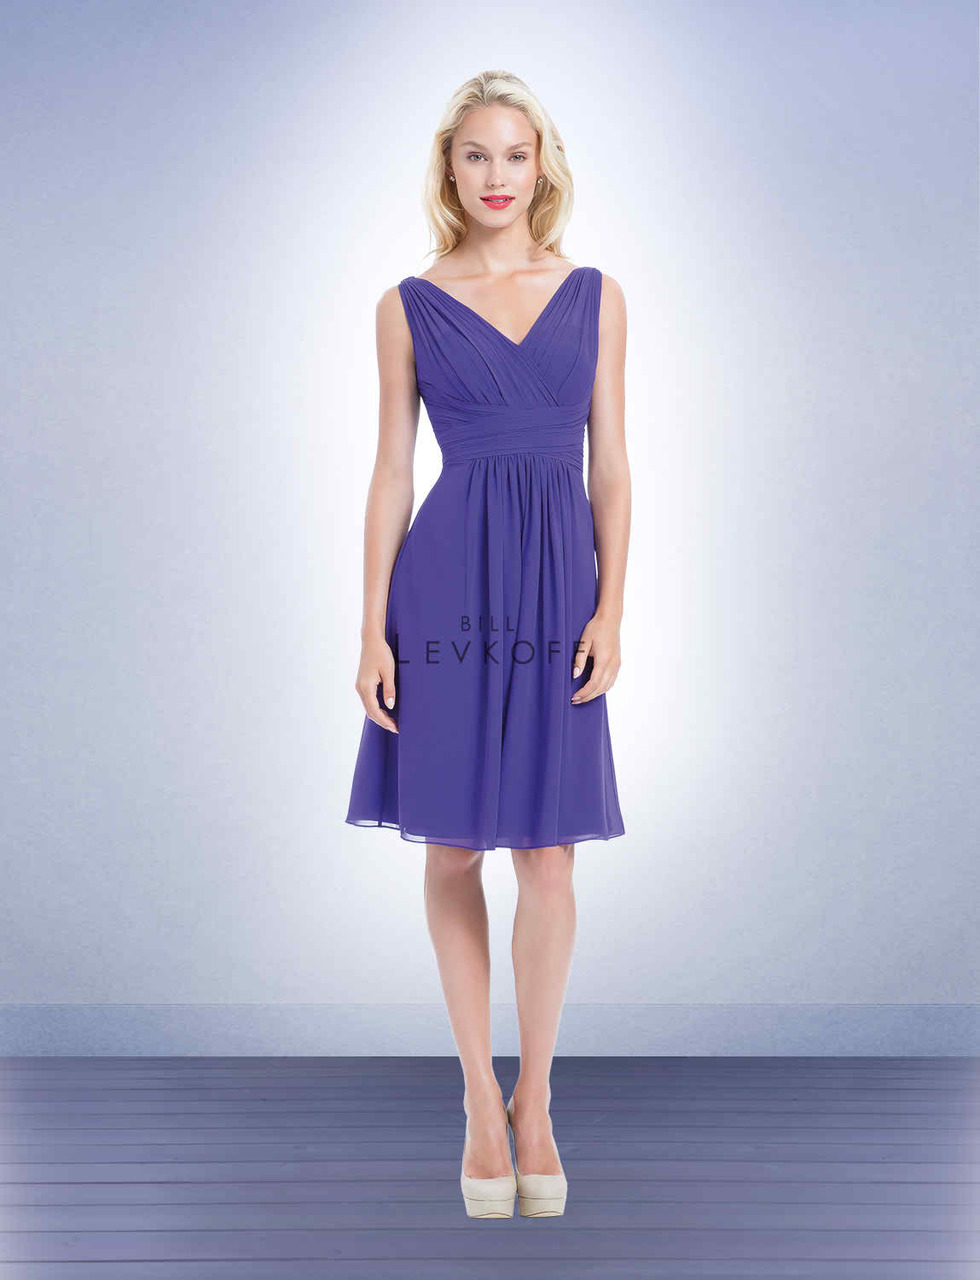 Bill Levkoff Bridesmaid Dress Style 1155 - Chiffon | DISCONTINUED